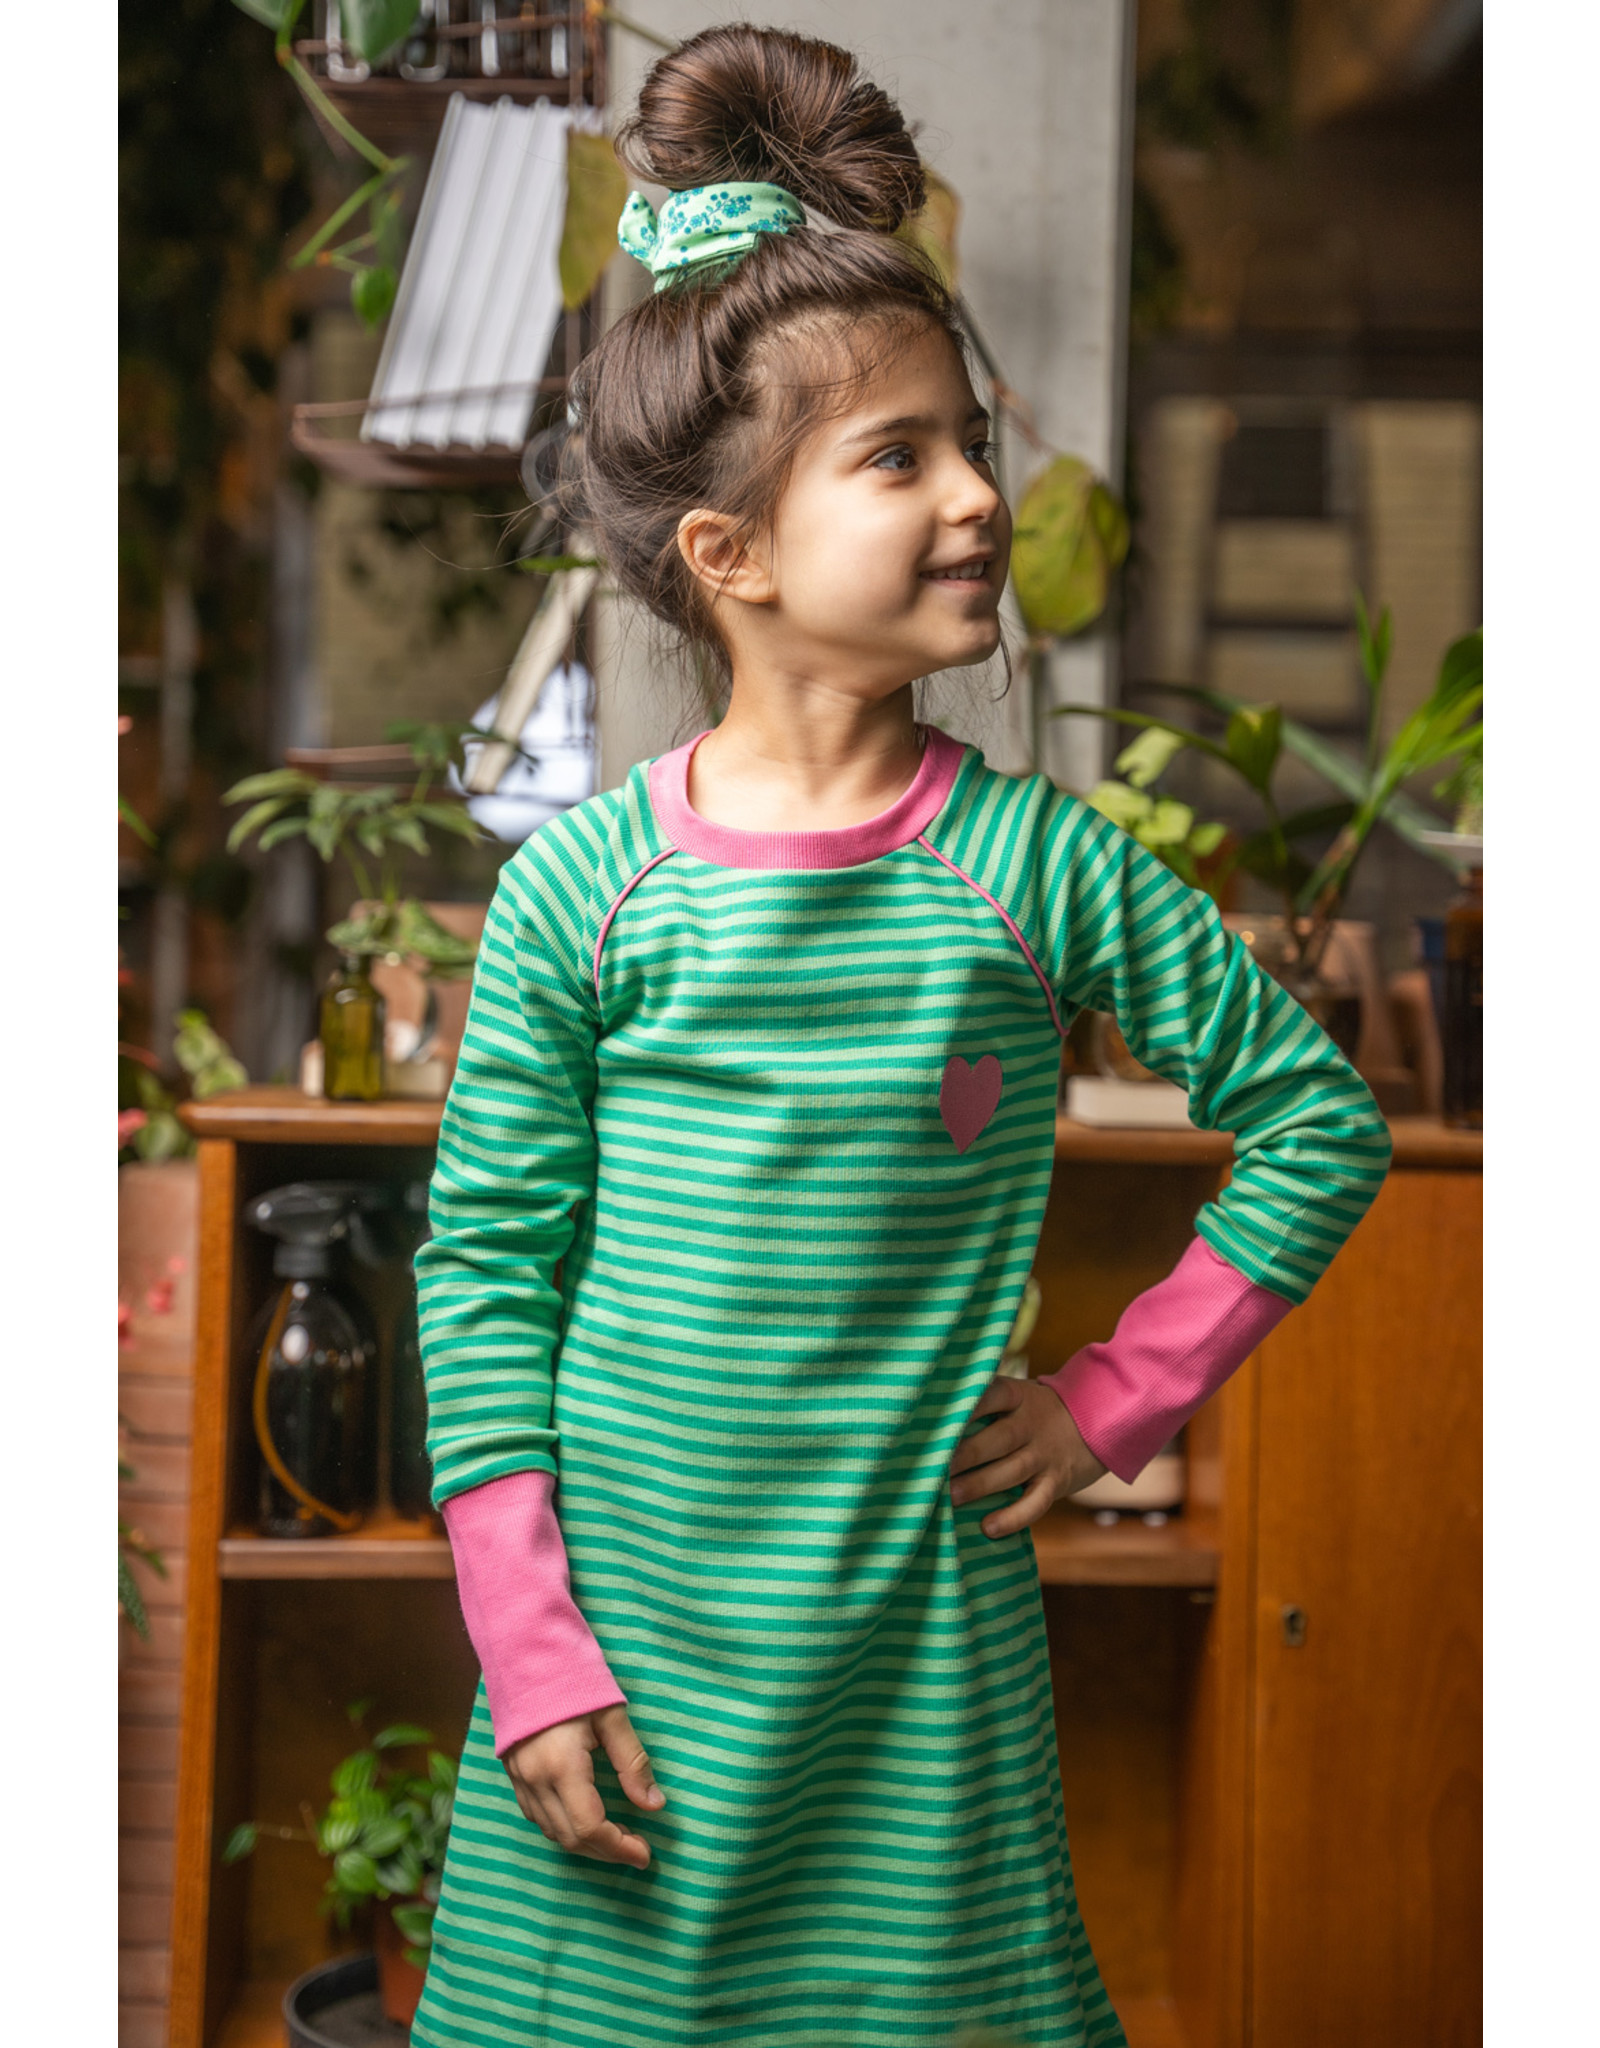 ALBA of Denmark Groen roze vrolijke streepjes jurk